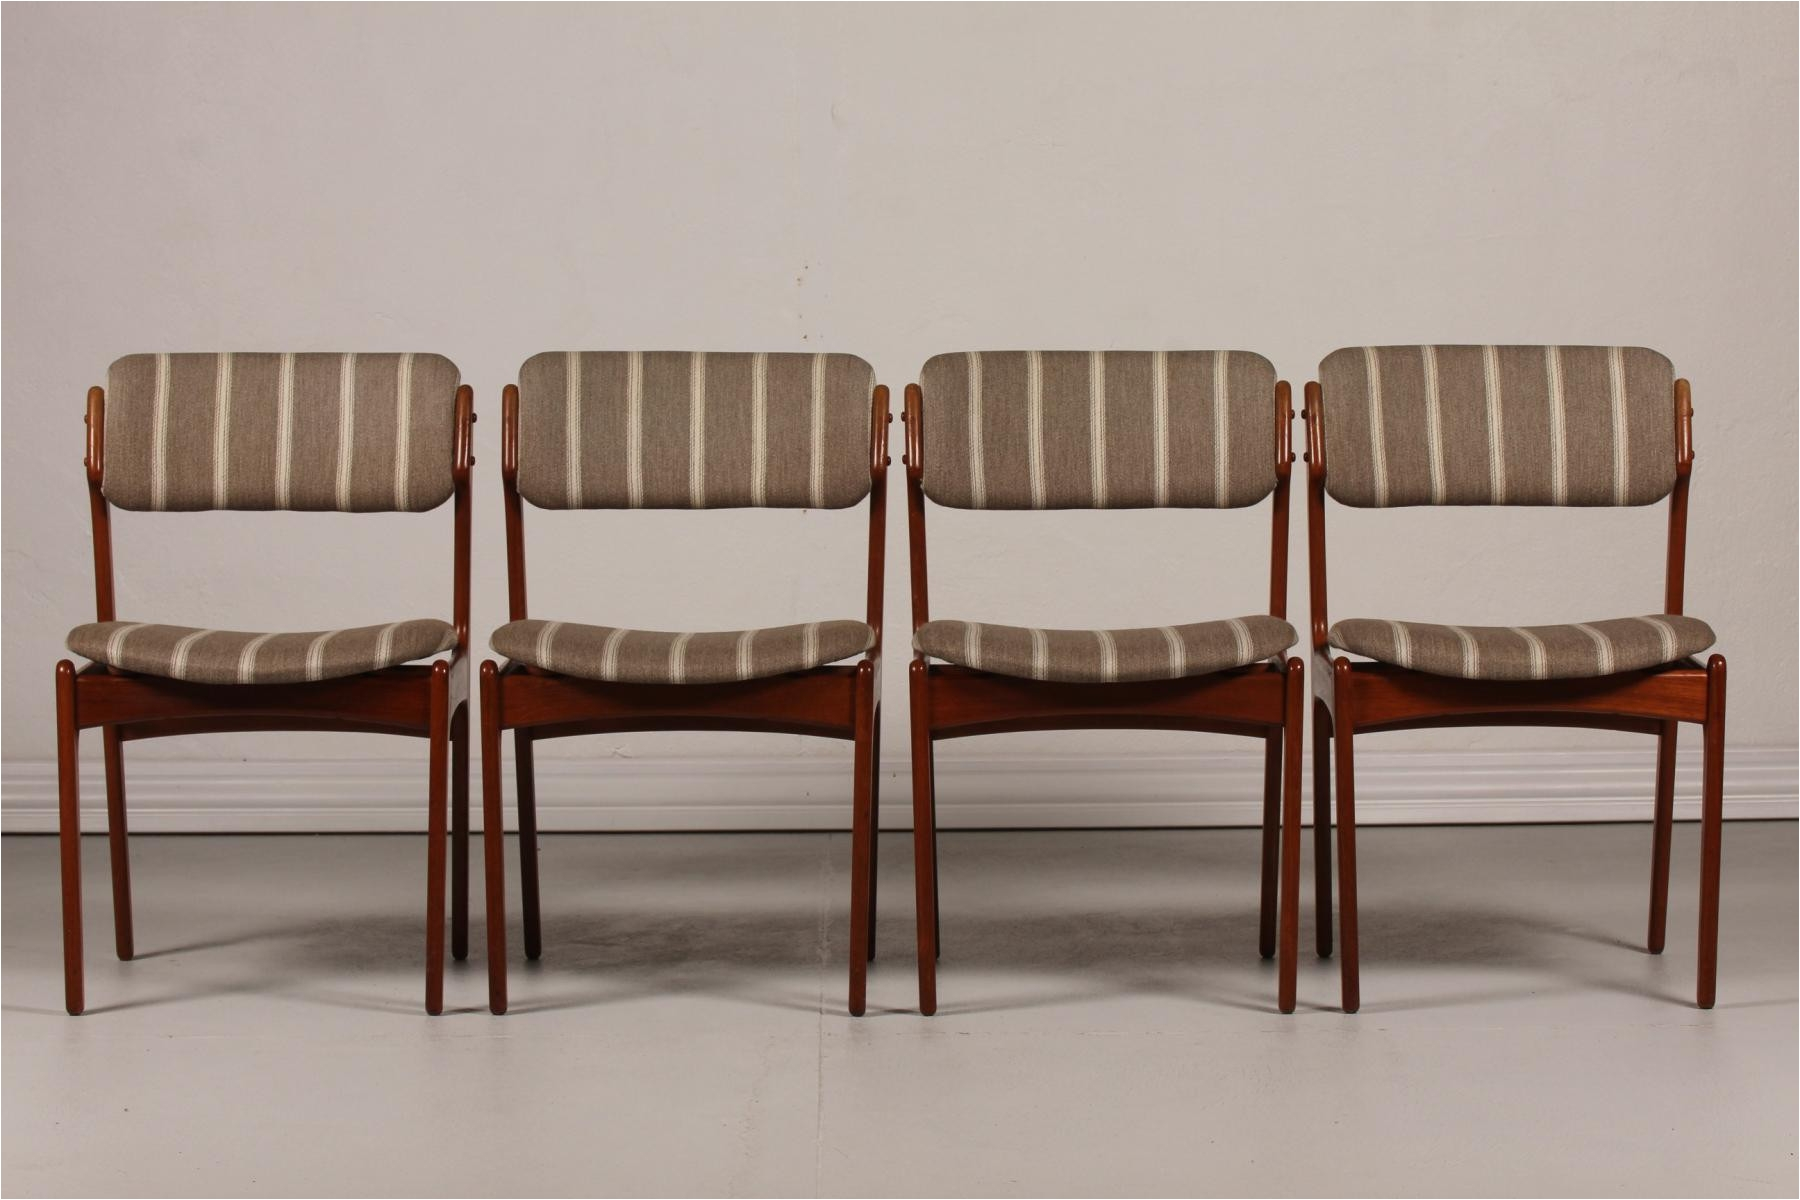 Restoration Hardware Professor Double Chair Restoration Hardware Metal Chair